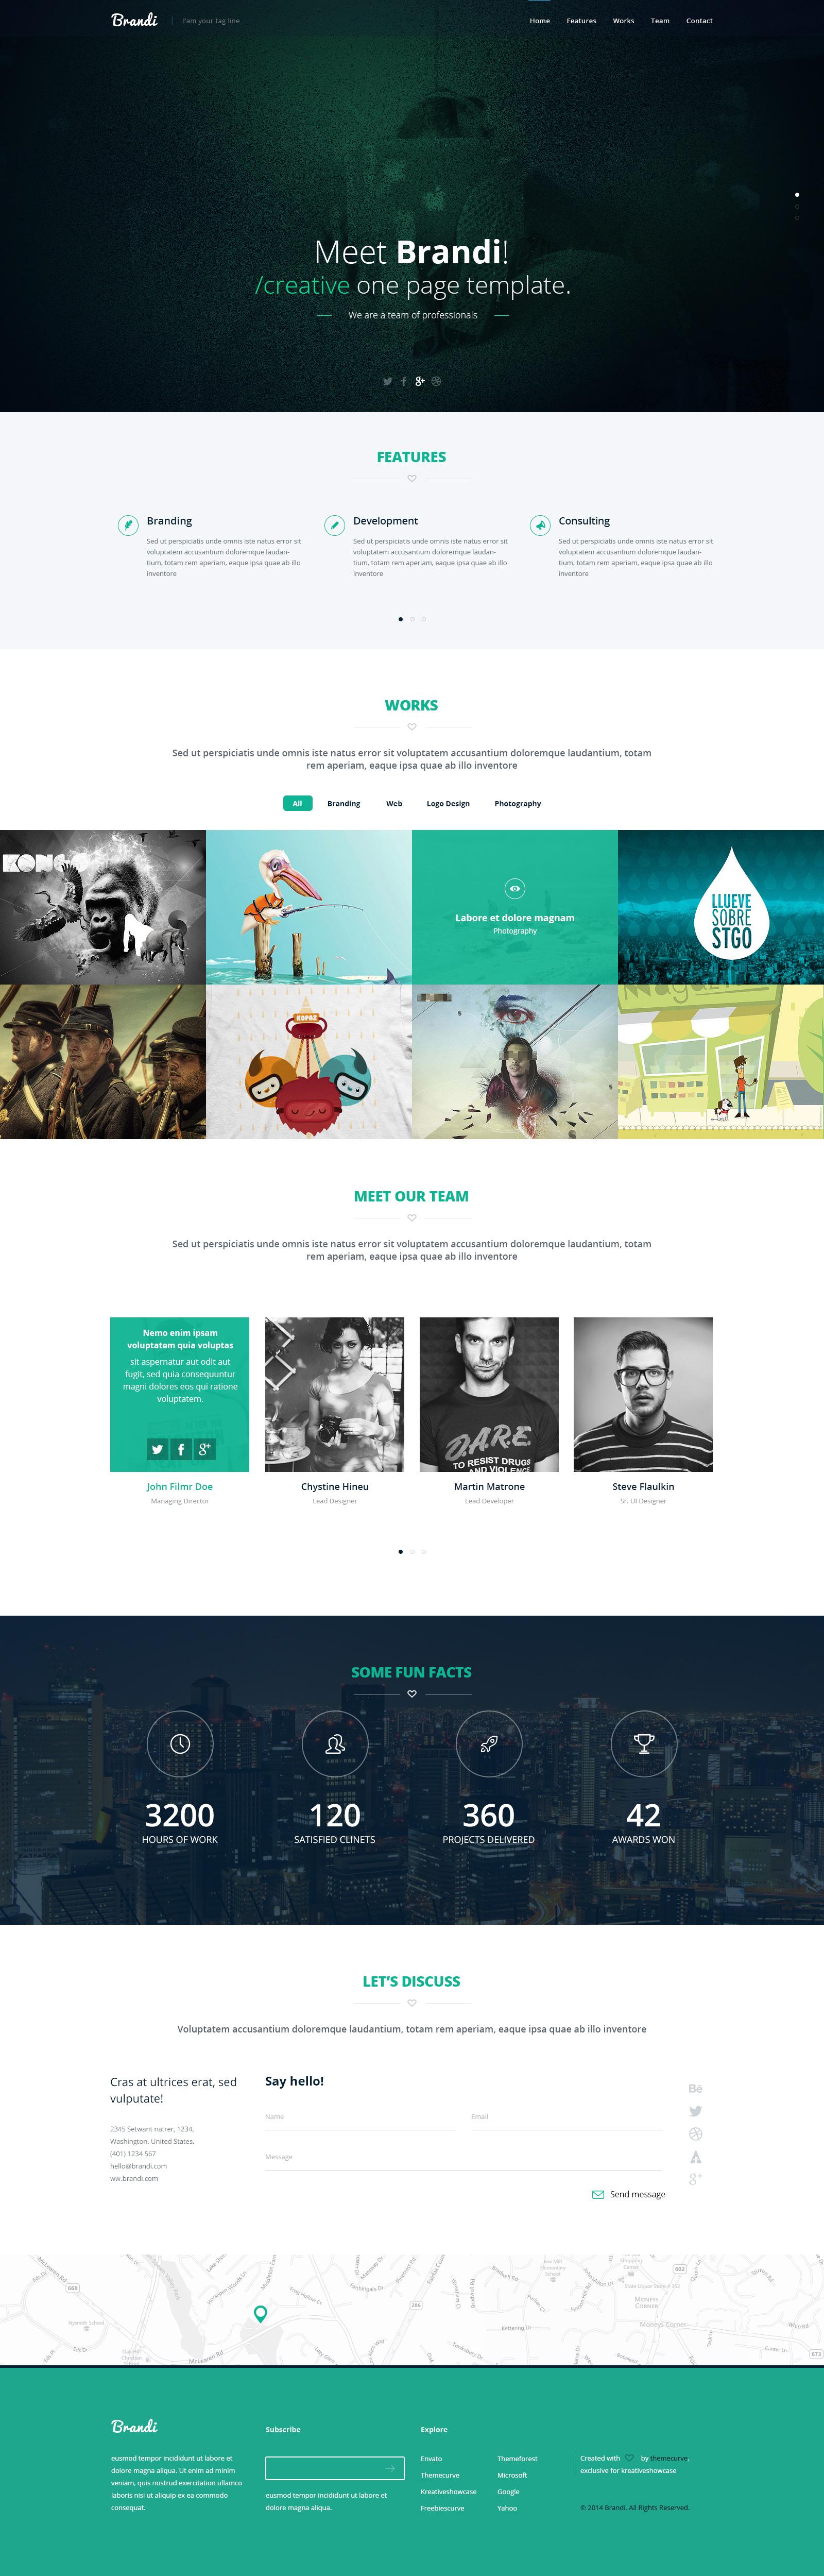 Freebie u brandi web design pinterest ui ux web design